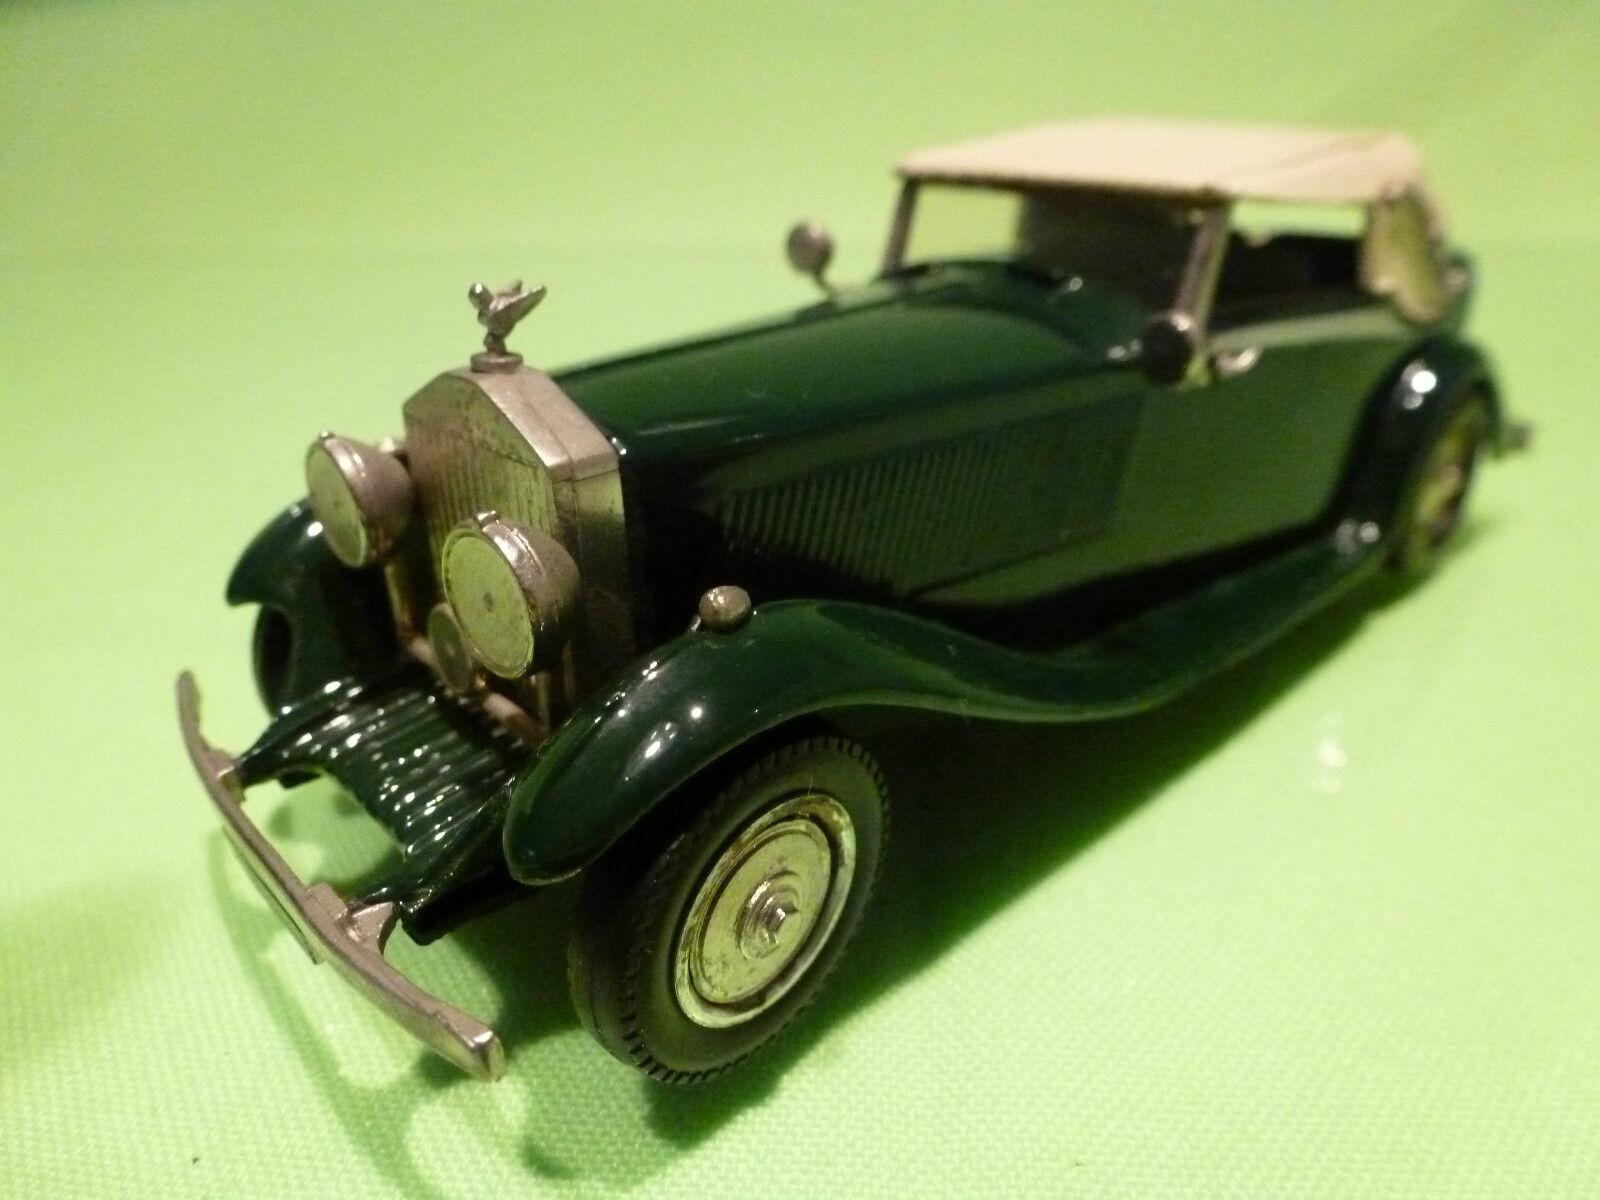 WESTERN MODELS ROLLS ROYCE  CONVERTIBLE CLOSED TOP - vert 1 43 - VERY GOOD  aucune hésitation! achetez maintenant!